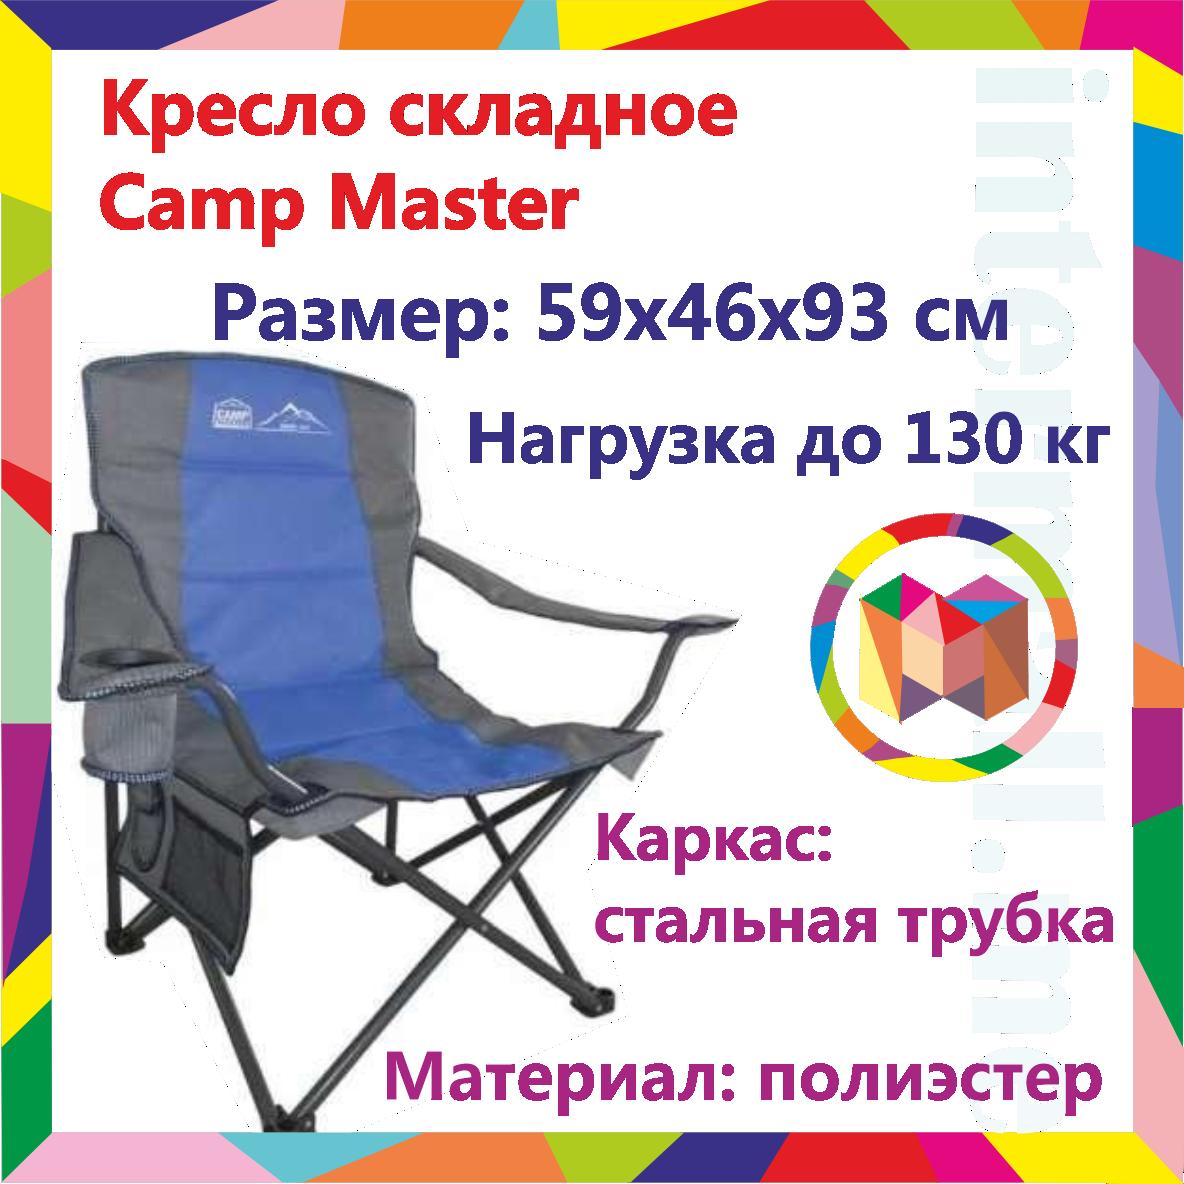 Кресло складное для пикника, с металлическим каркасом, стул CAMP MASTER , 59х46х93 см